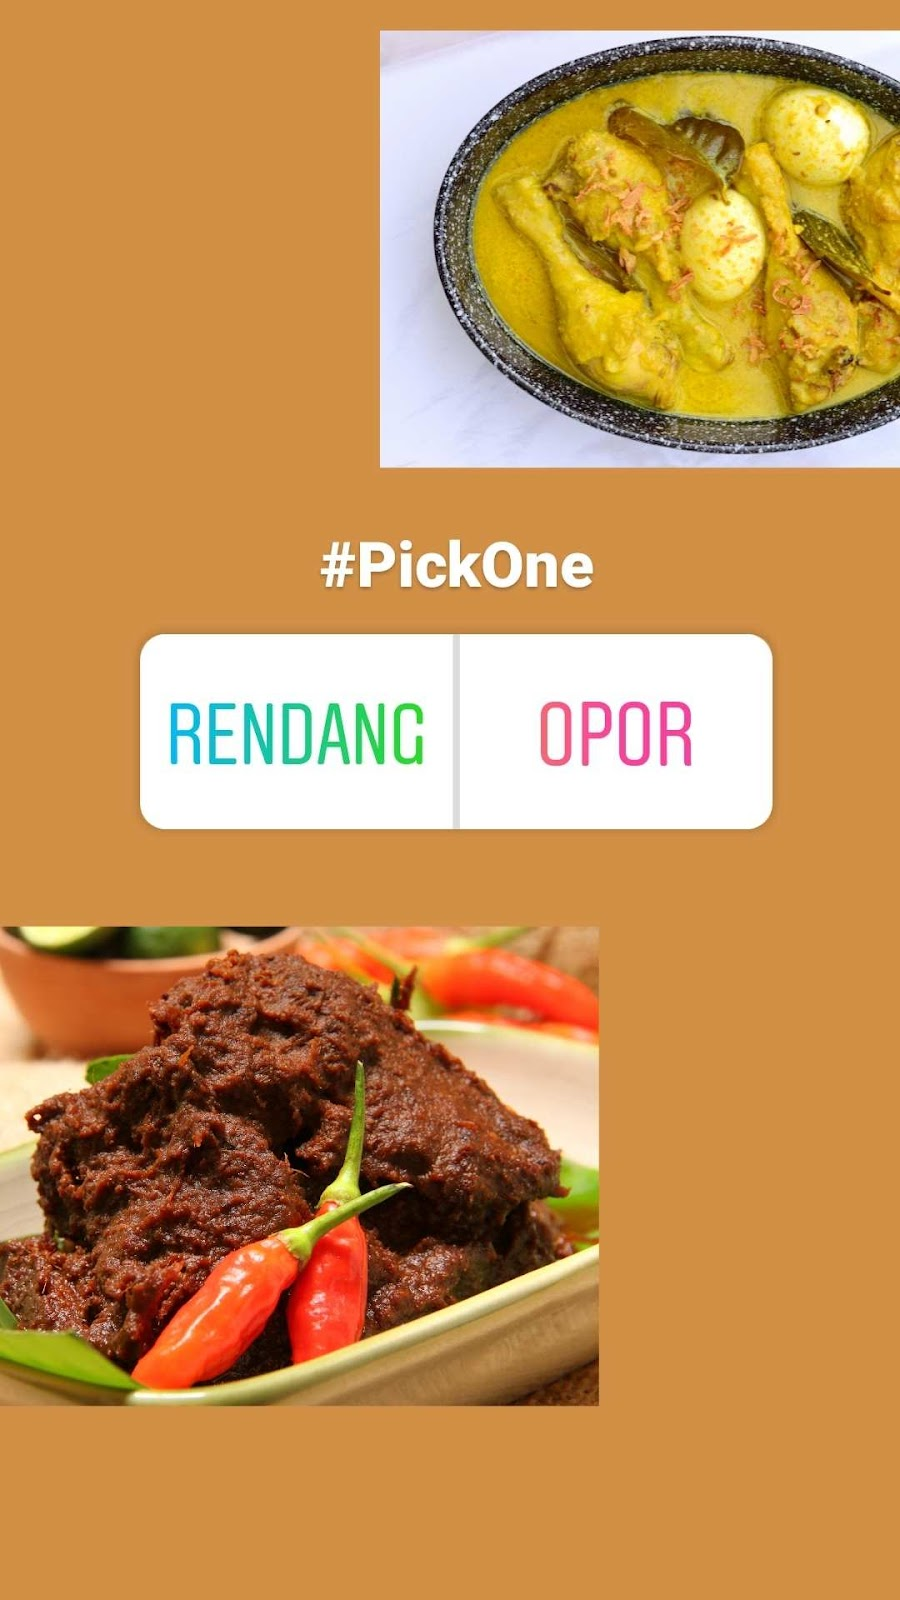 Contoh konten instagram bisnis #PickOne